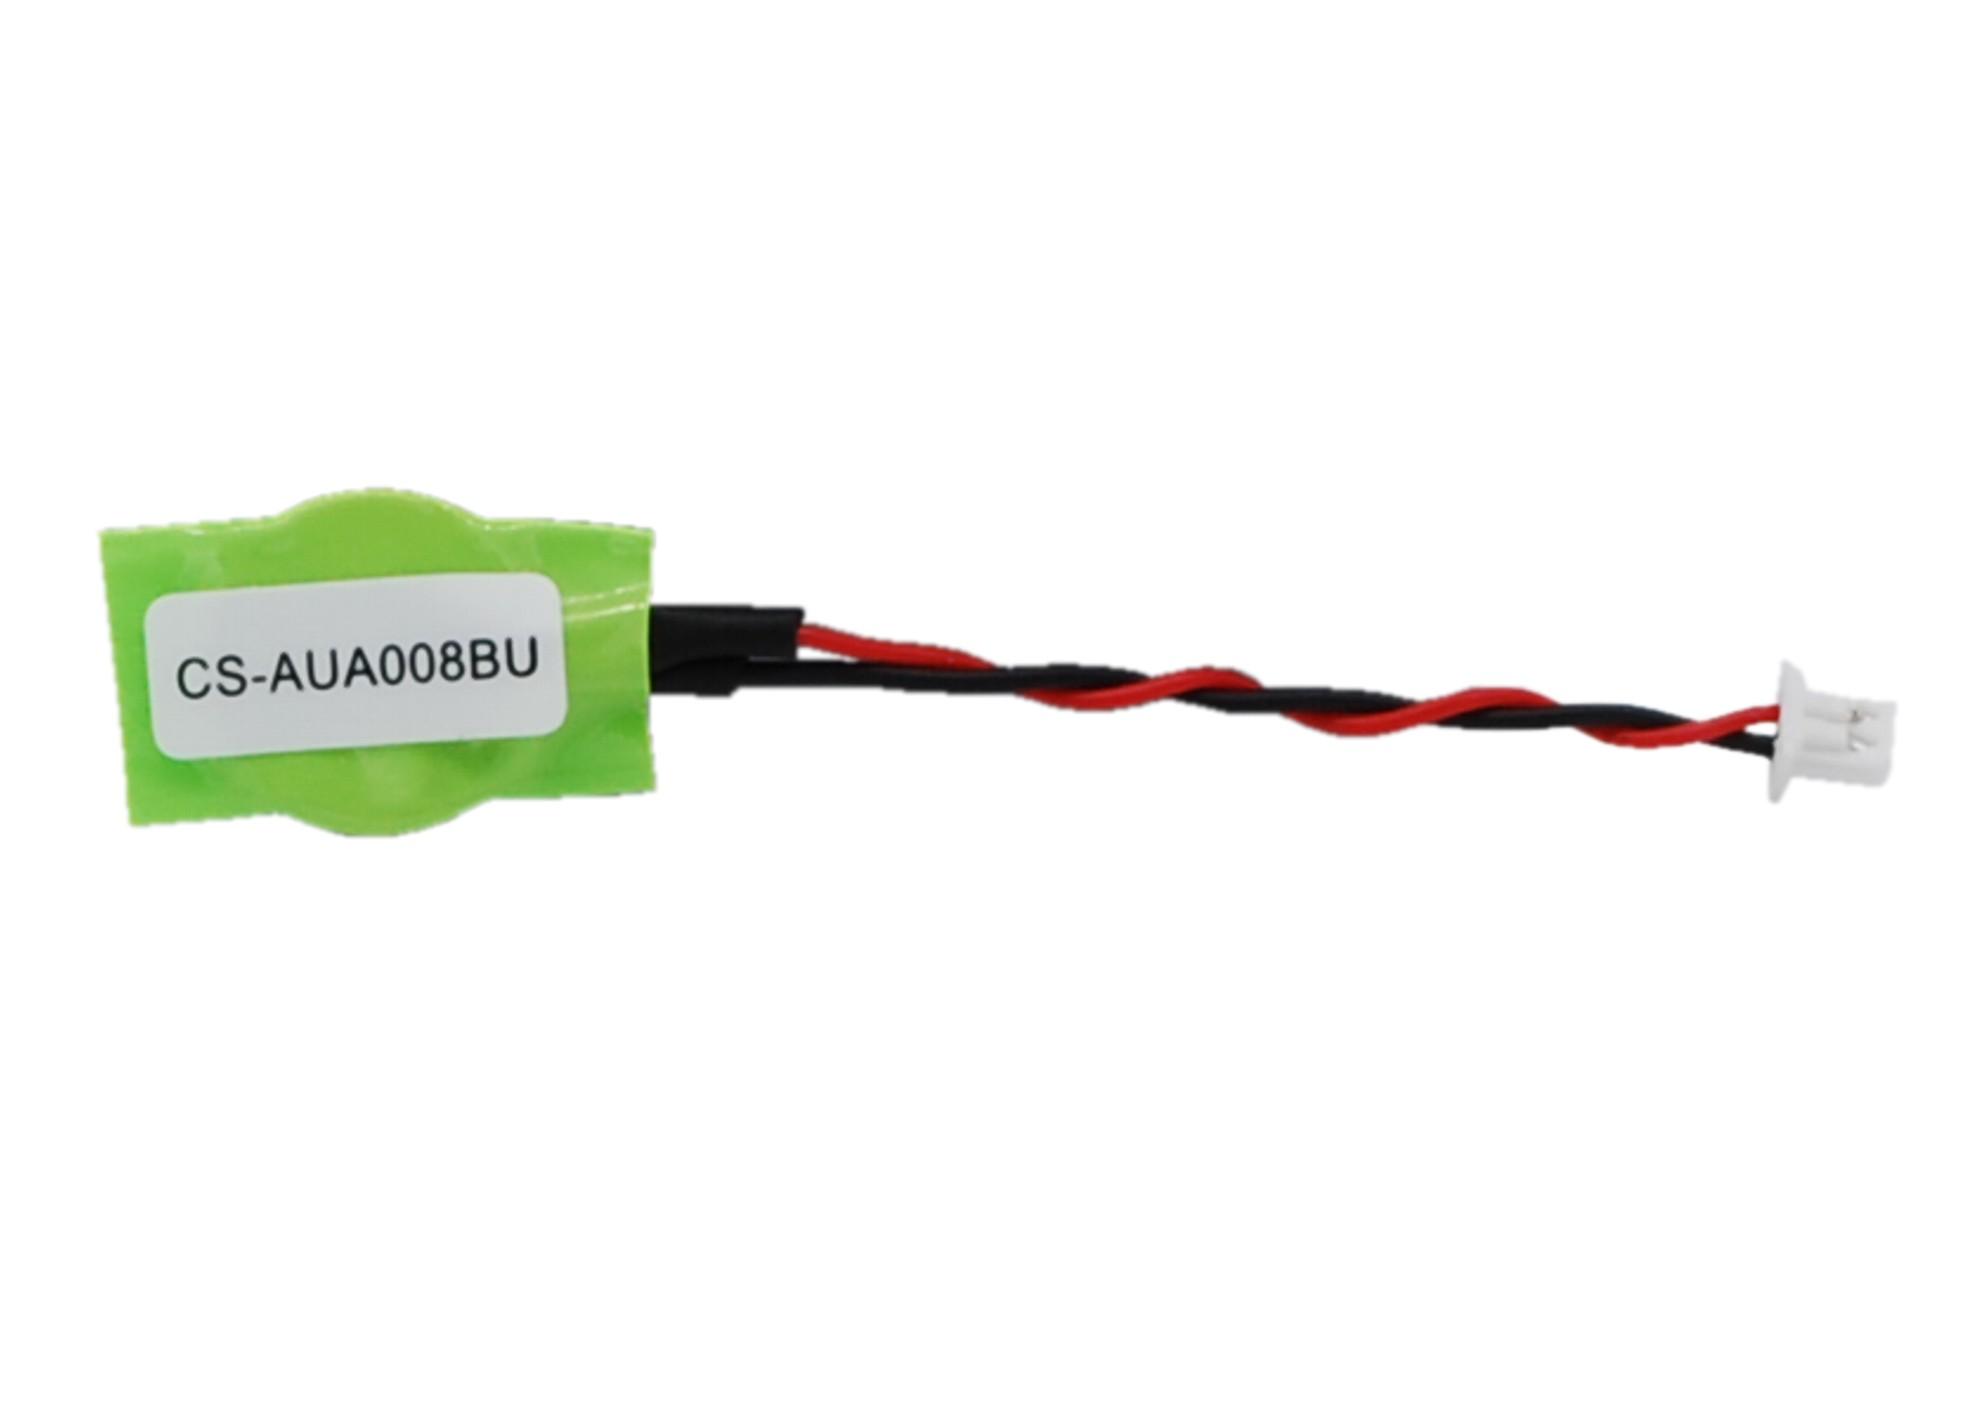 Cameron Sino baterie cmos pro ASUS Eee PC 1005HA-BLK140X 3V Li-ion 40mAh zelená - neoriginální